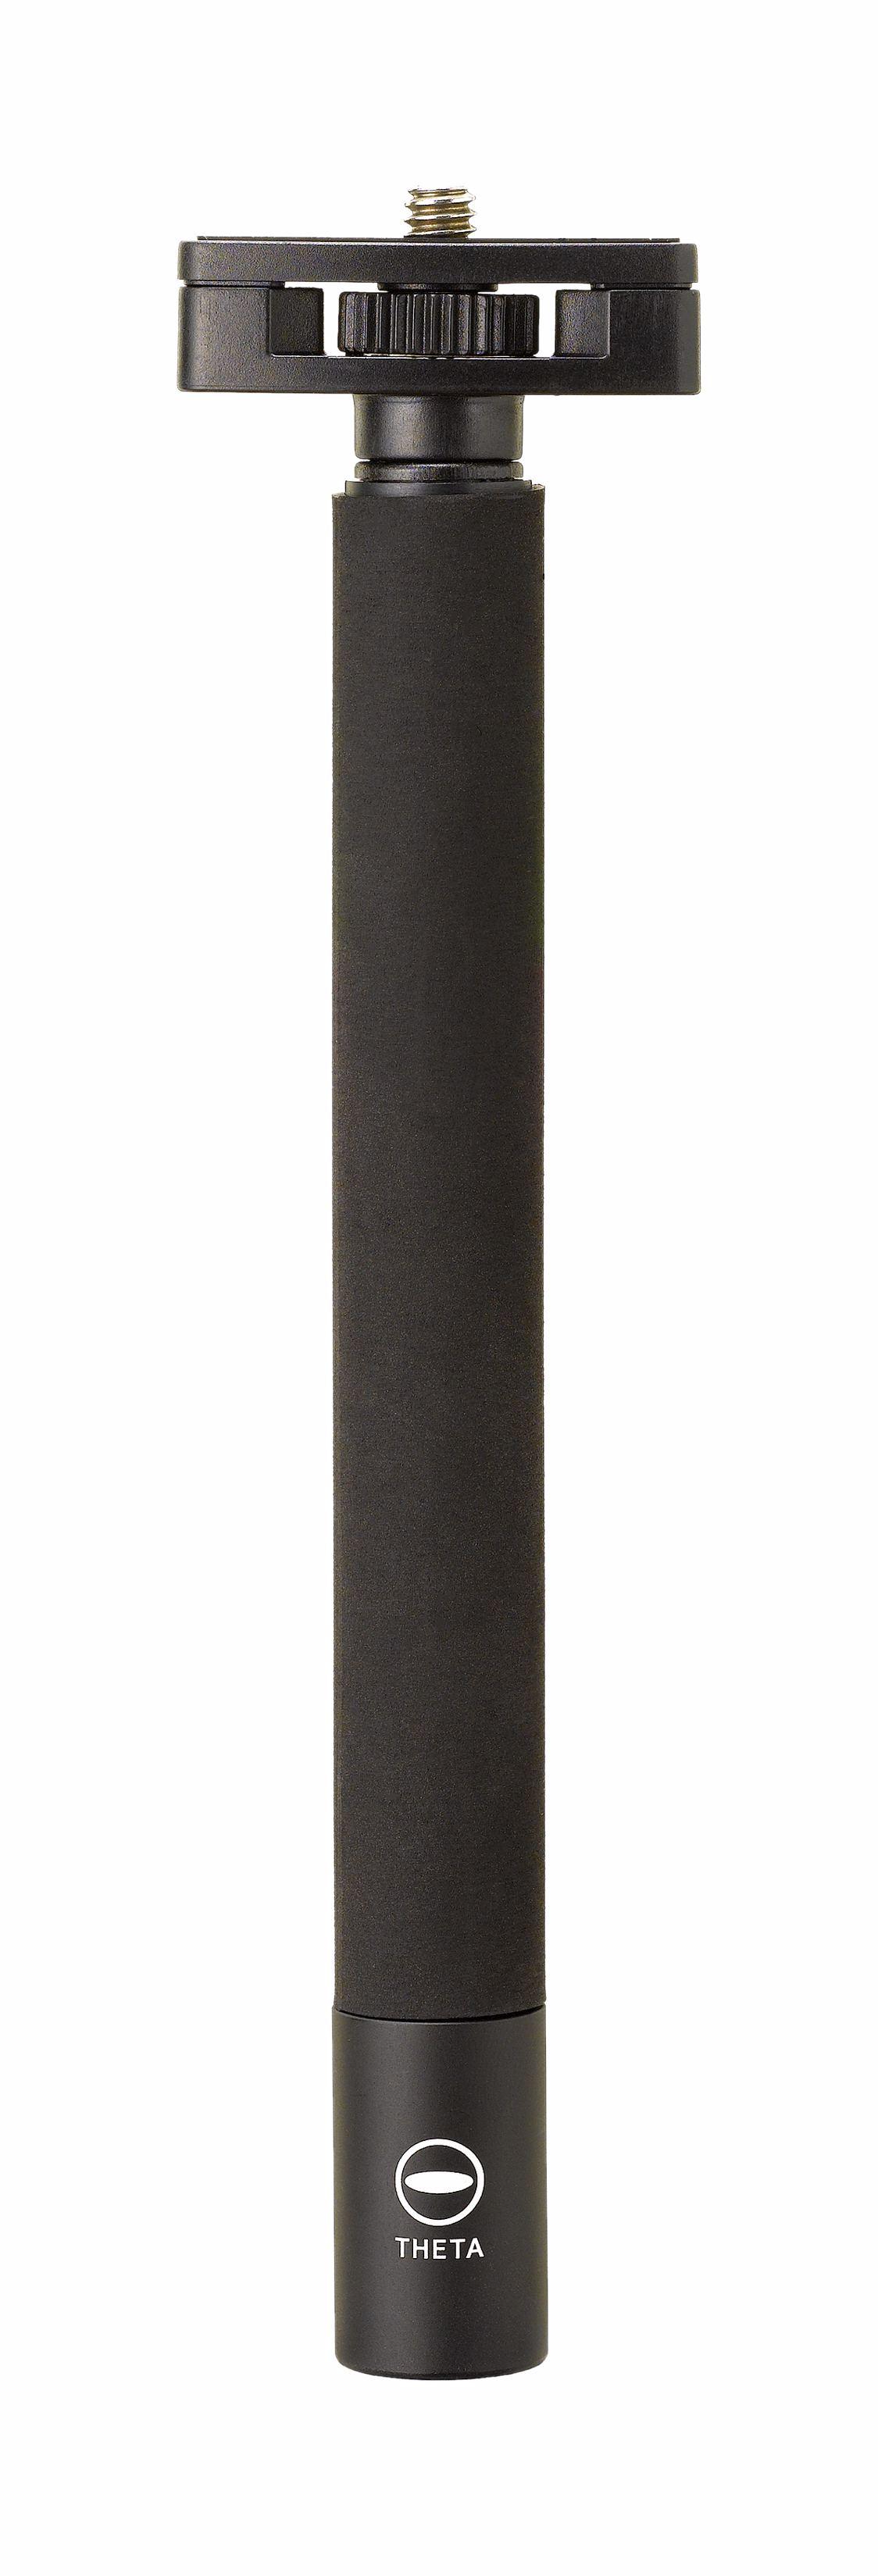 Ricoh Pentax - Ricoh Theta  TM3 Stick